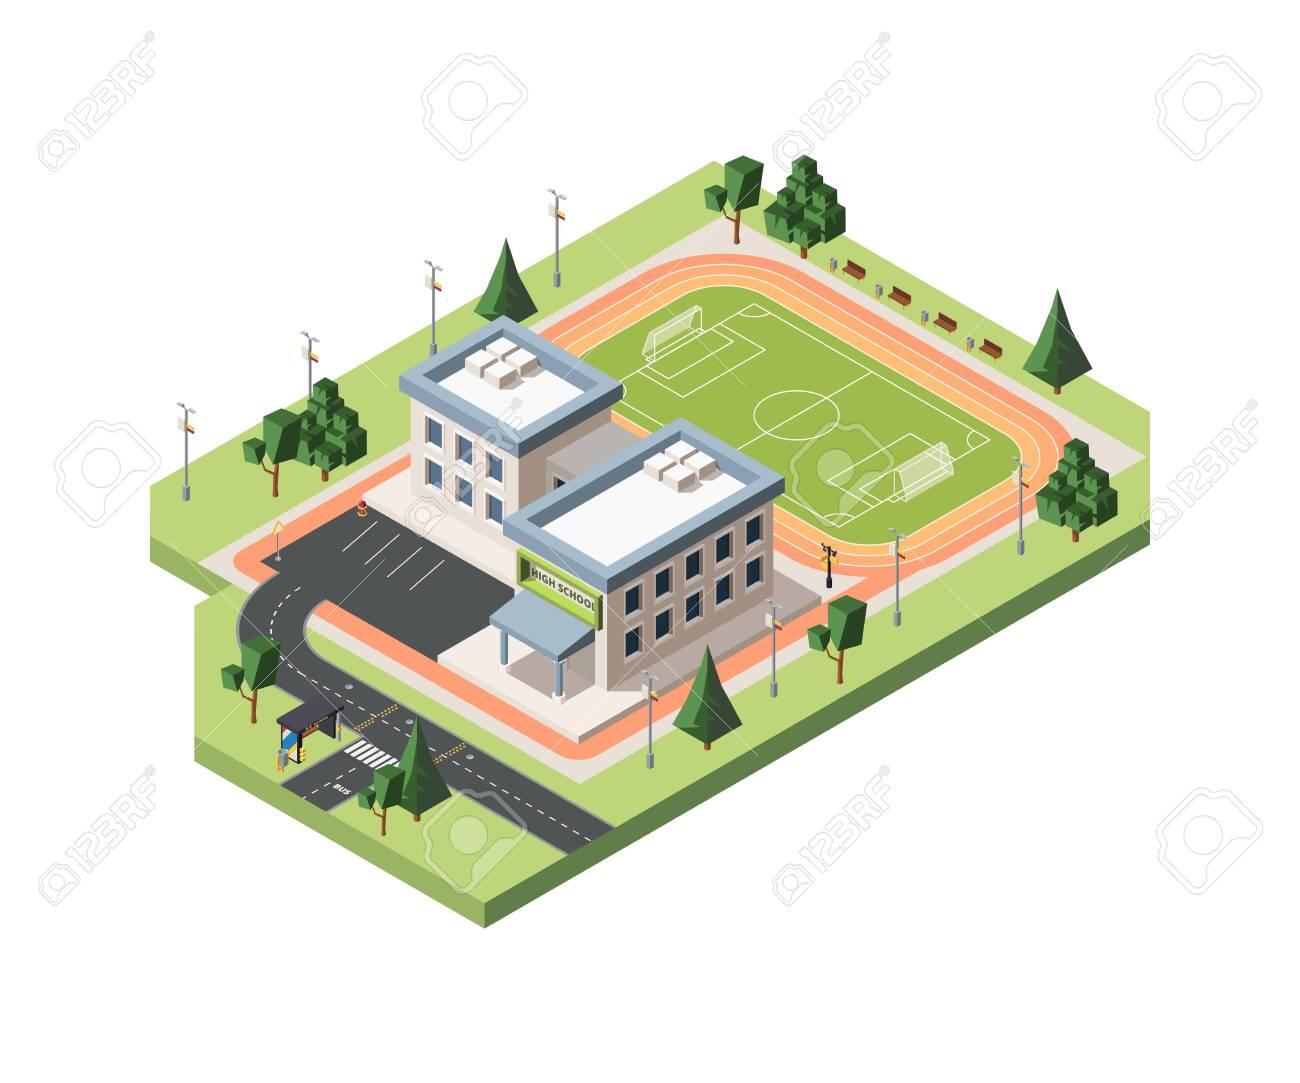 High school soccer field vector isometric illustration - 138471631